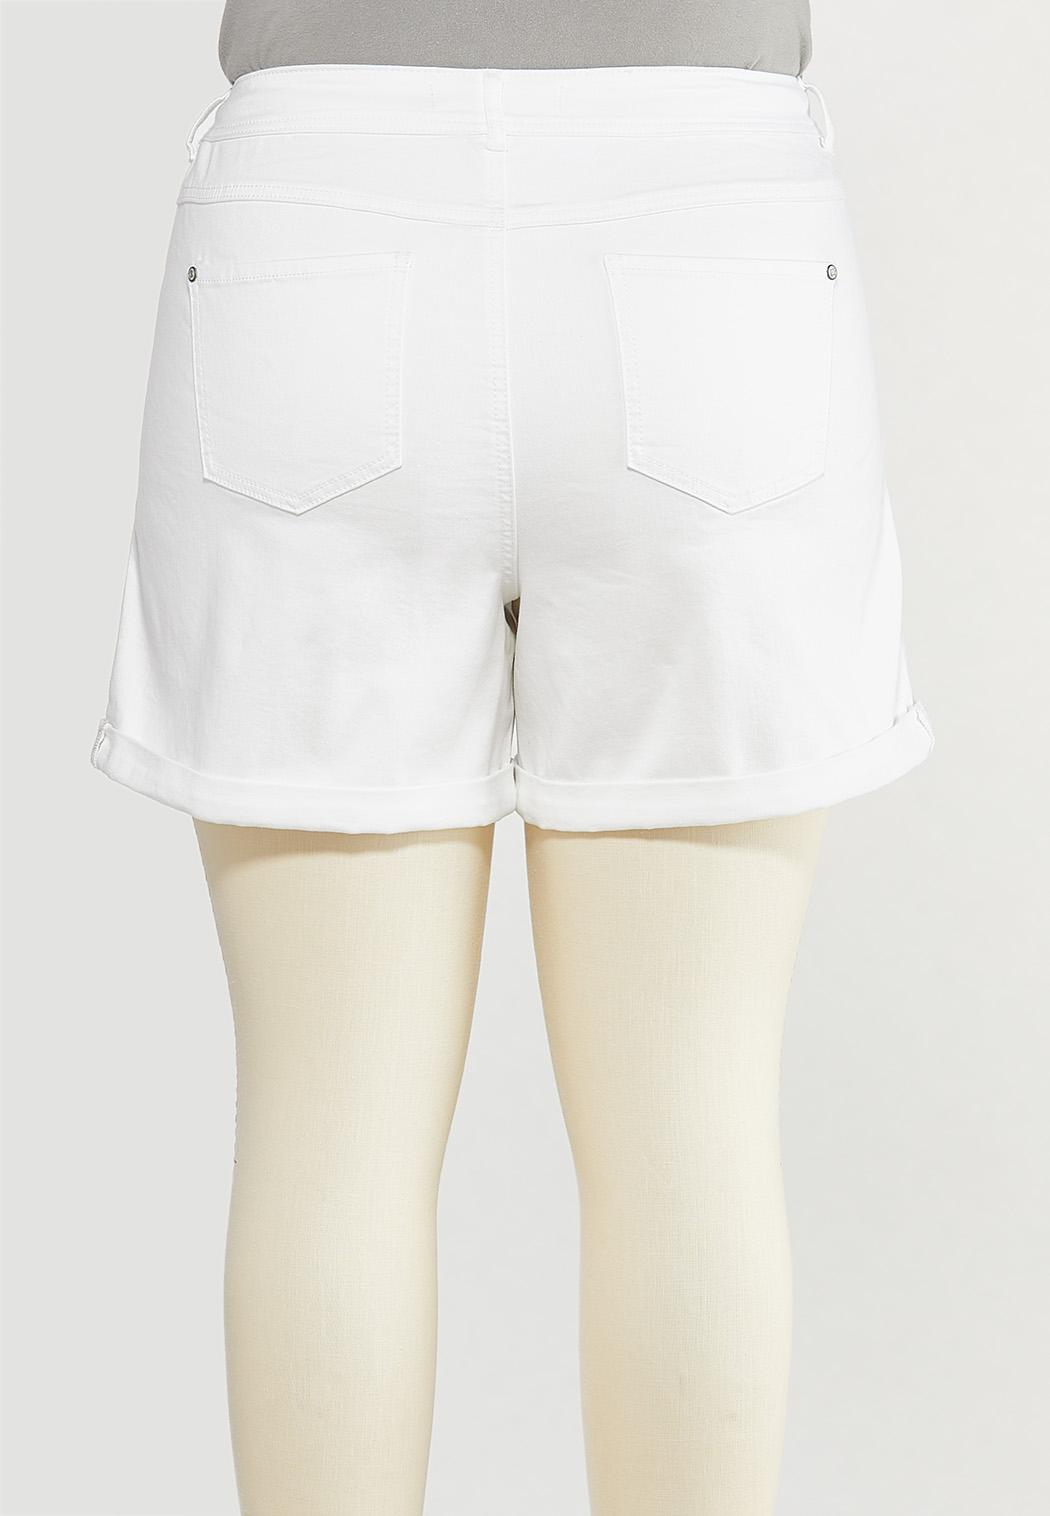 Plus Size White Denim Shorts (Item #44552452)